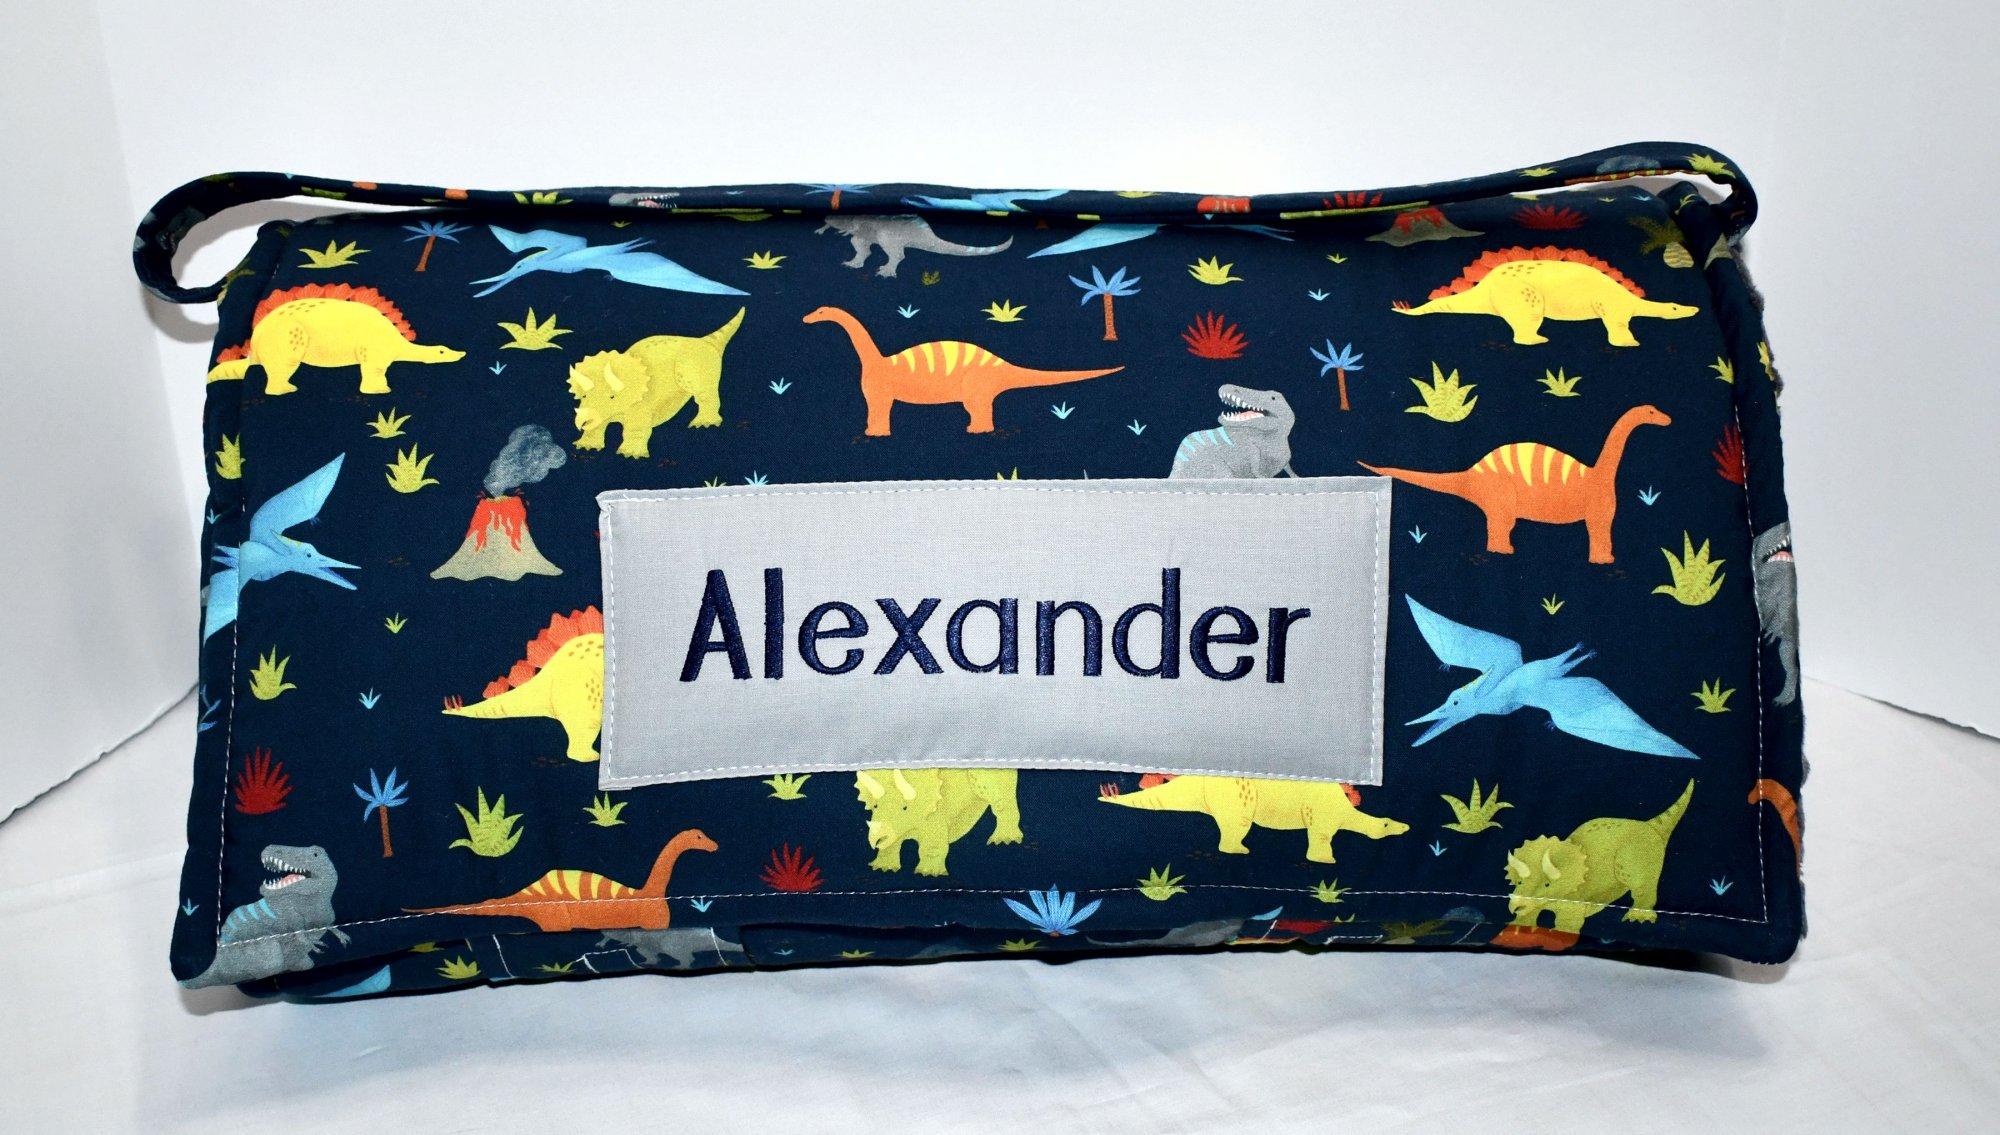 Dinosaur Navy Prehistoric Jurassic Kids Nap Mat with Grey Blanket, Personalized Preschool Kinder Toddler Daycare Sleeping Mat